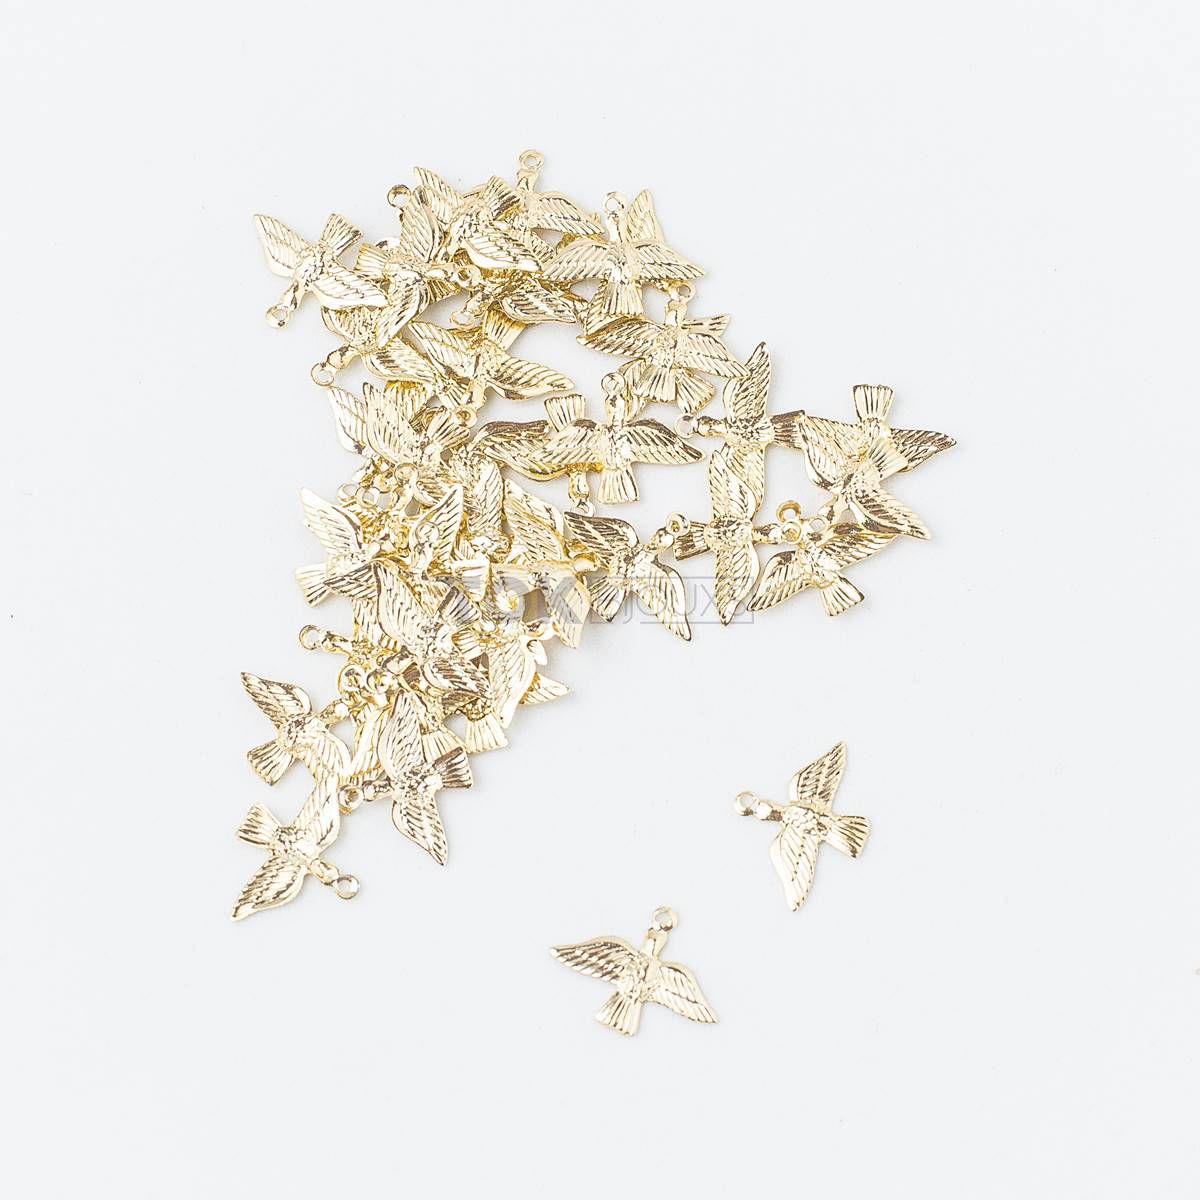 Pingente - Divino Espirito Santo - Dourado - 1000 unid